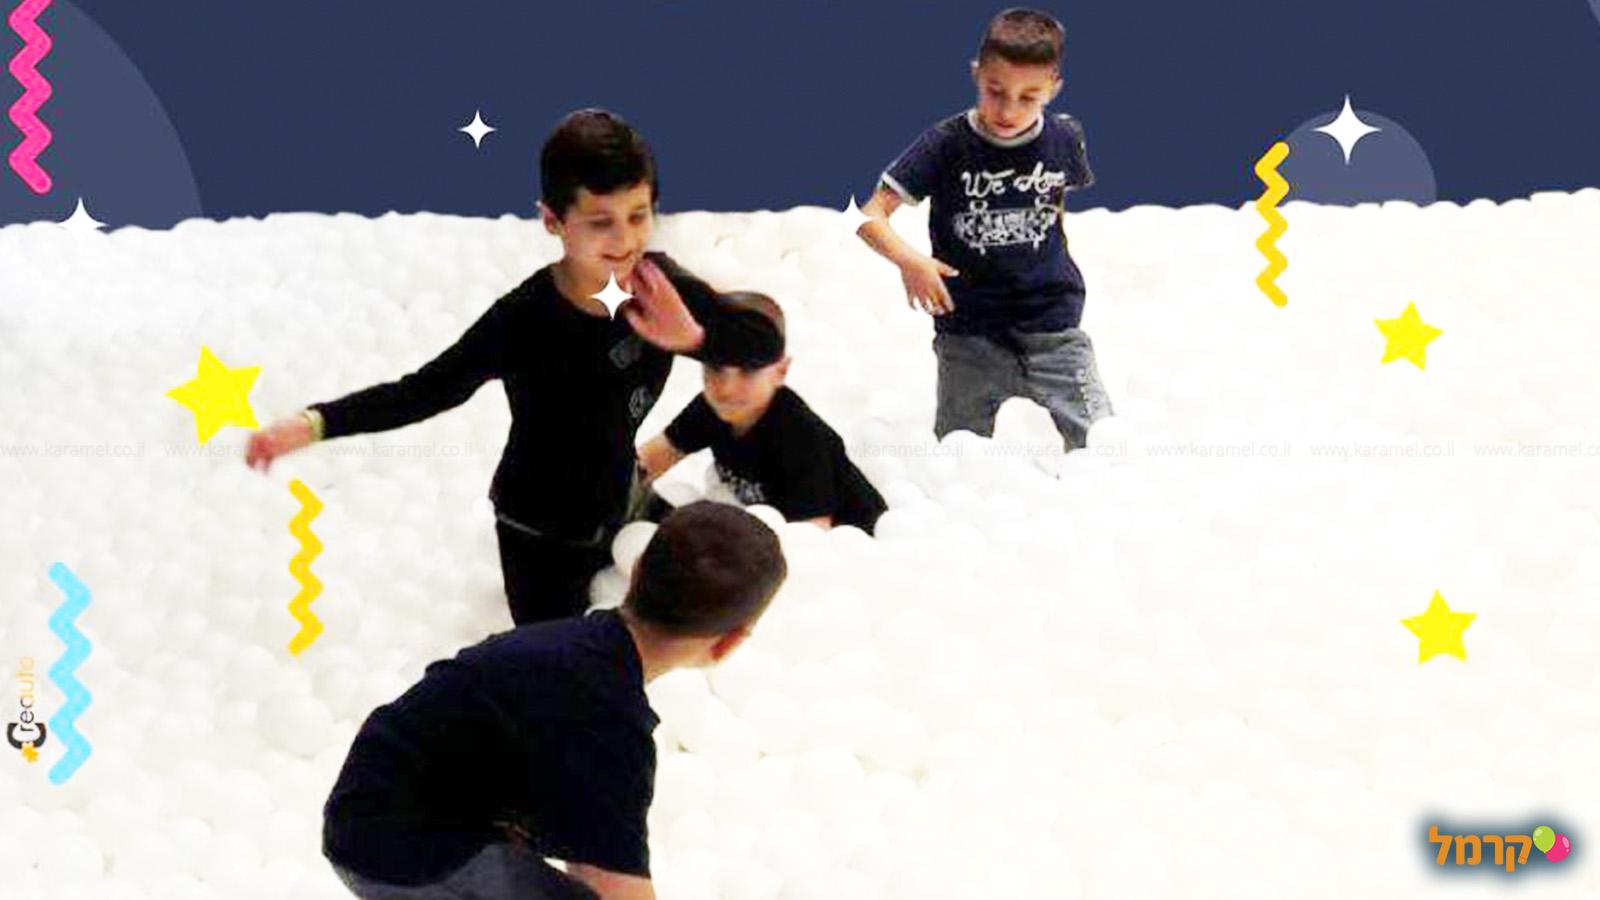 White Pool - מתחם כדורים ענק - 073-7590511